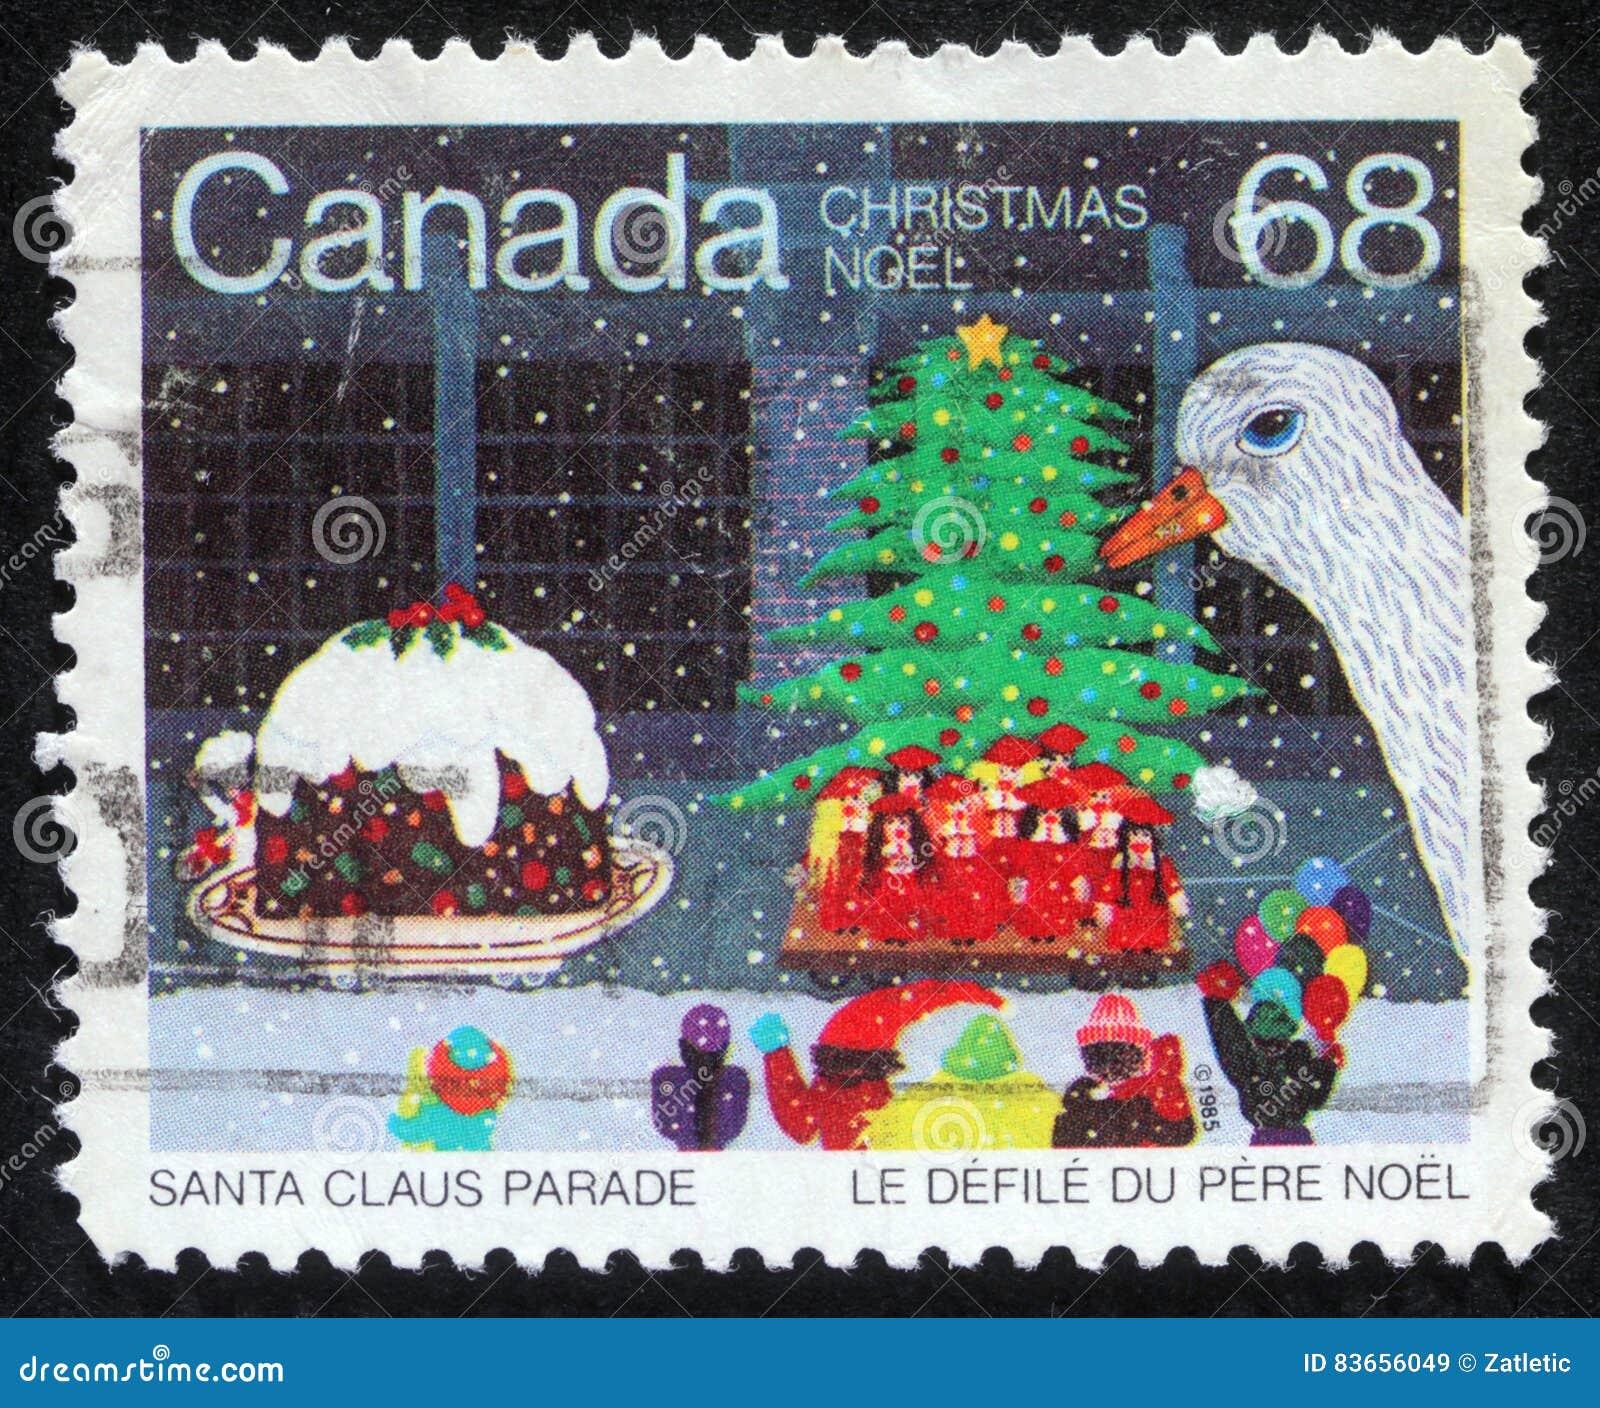 Timbre de Noël imprimé dans le Canada